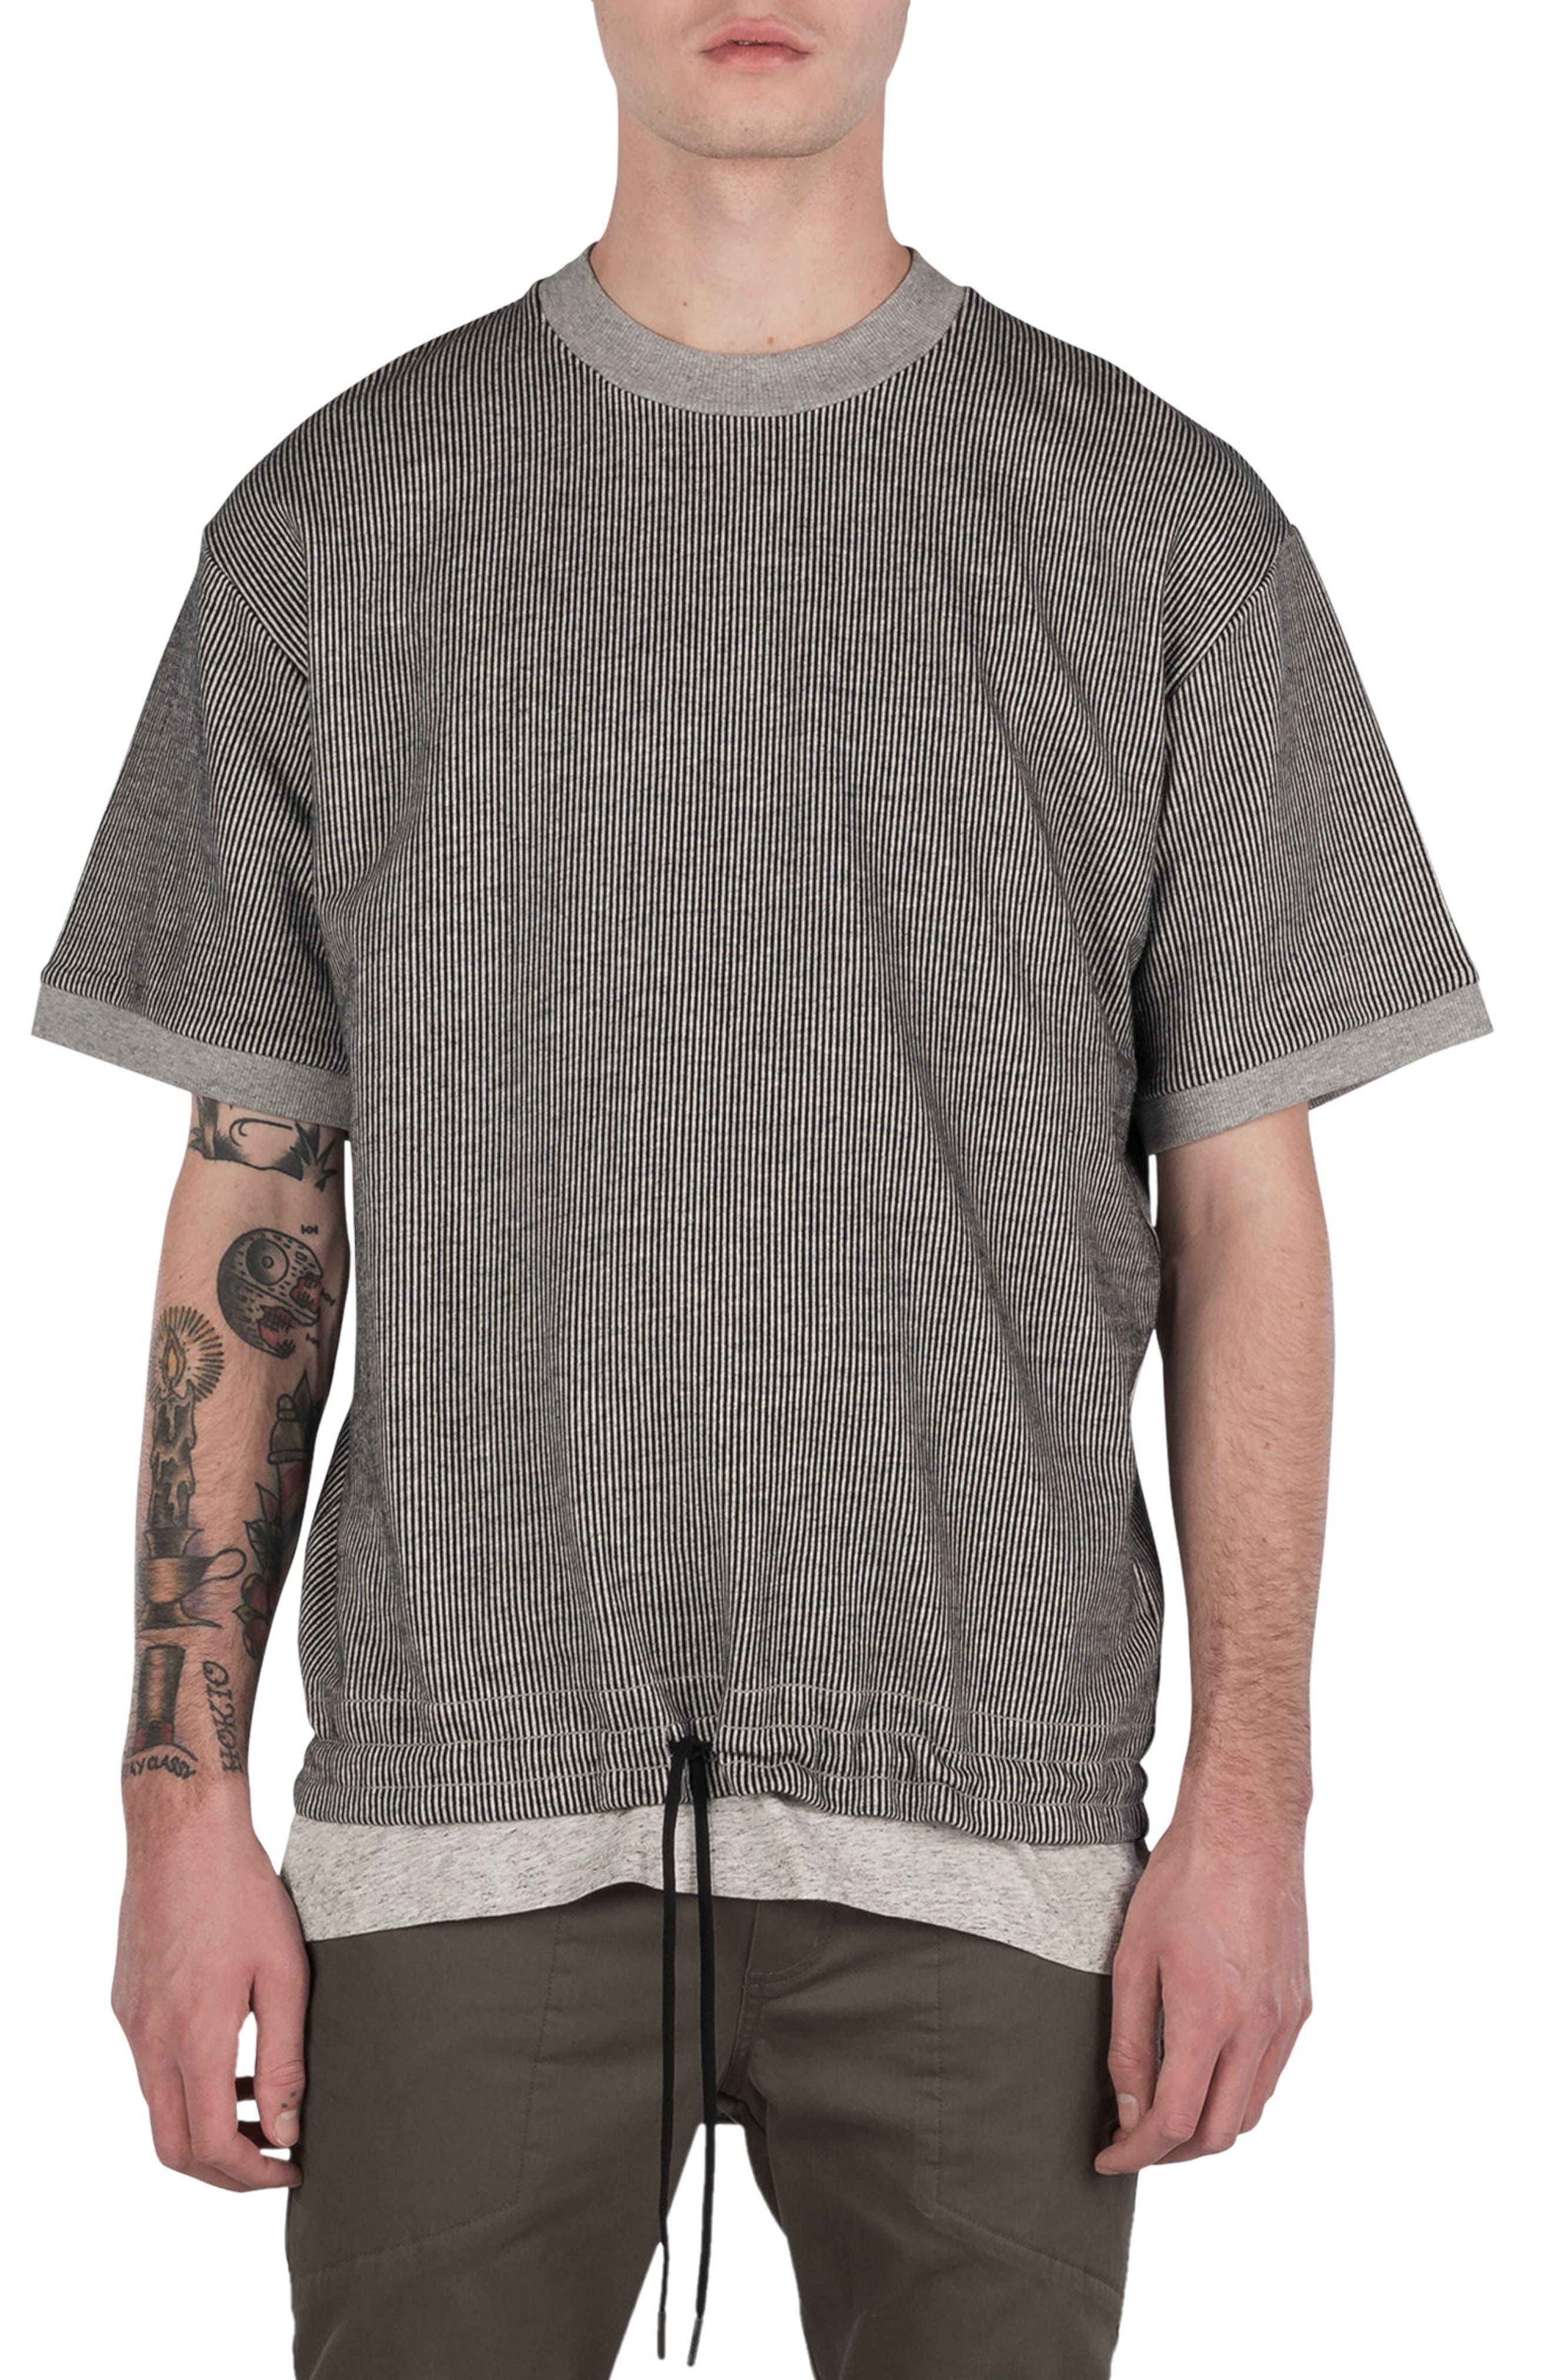 Stripe Box Sweatshirt,                         Main,                         color, Storm Marle/ Black